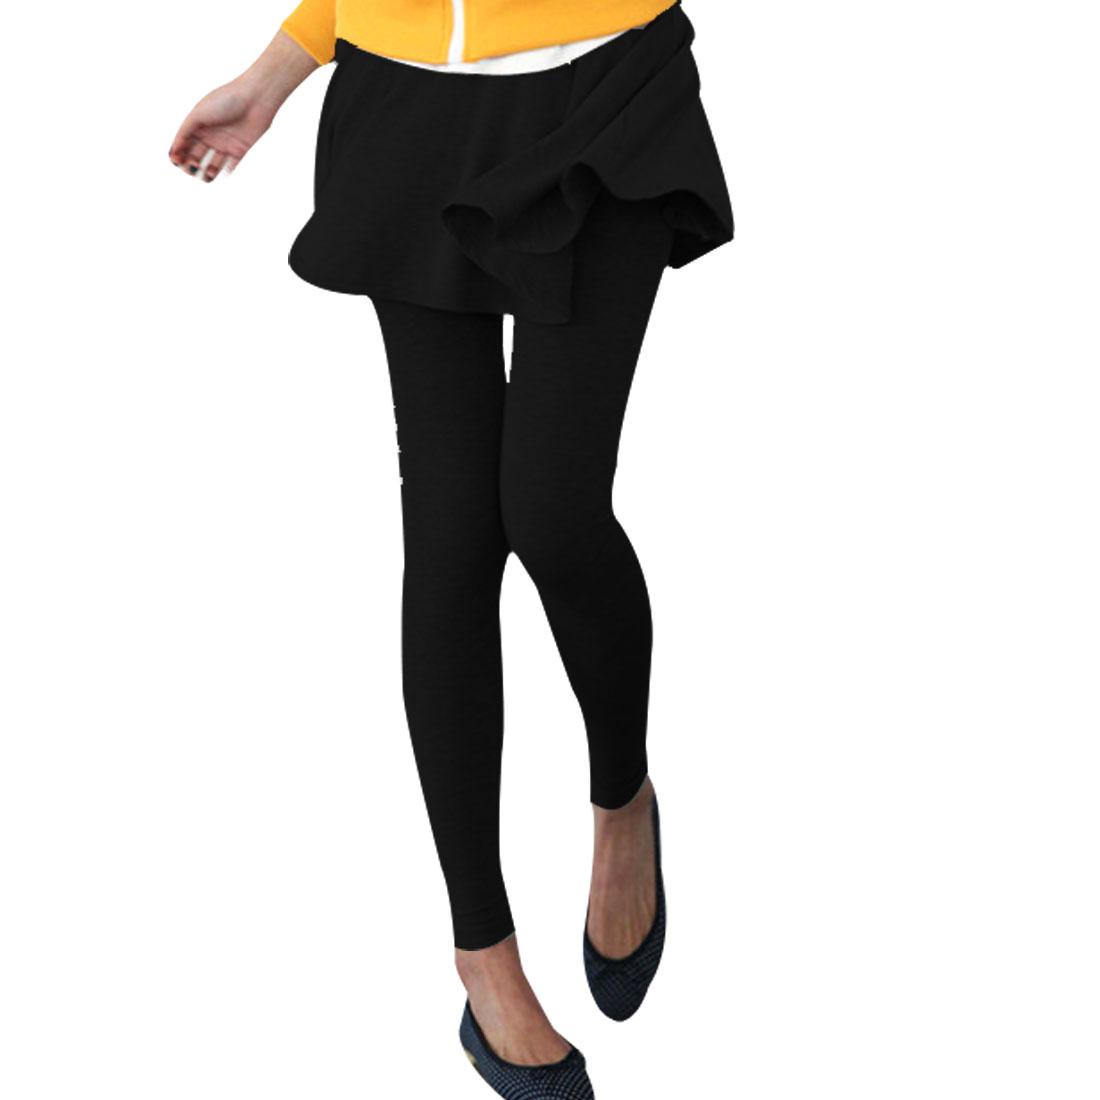 Women Ruffled Hem Slim Fit Autumn Stylish Pantskirt Leggings Black XS